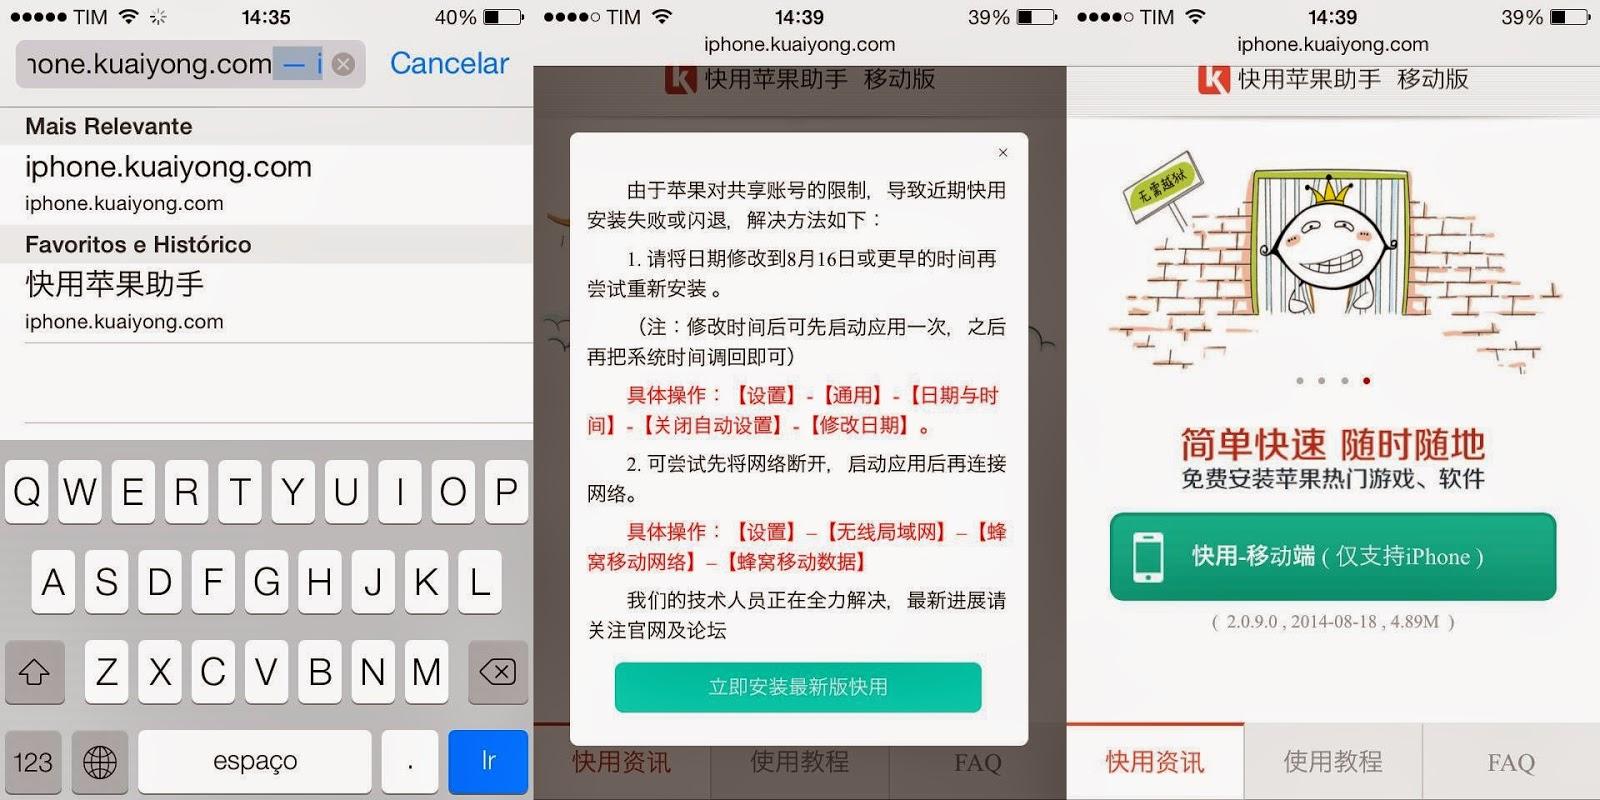 Ana Carla Oliveira: Como baixar aplicativos pagos no iPhone